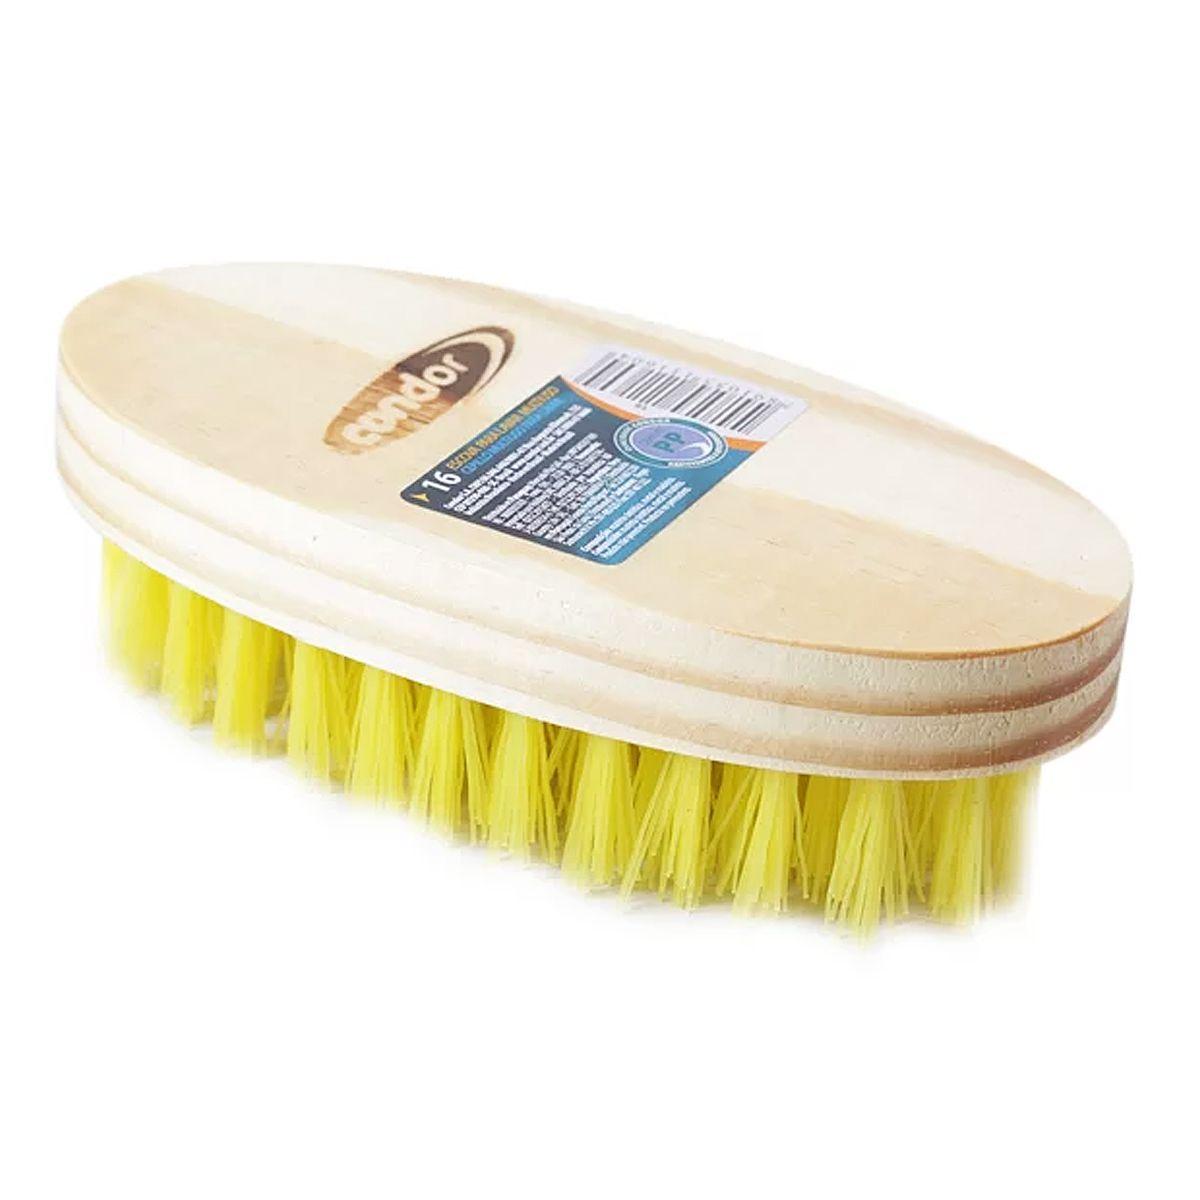 Escova Cerdas Duras para Limpeza de Estofado 16 Condor